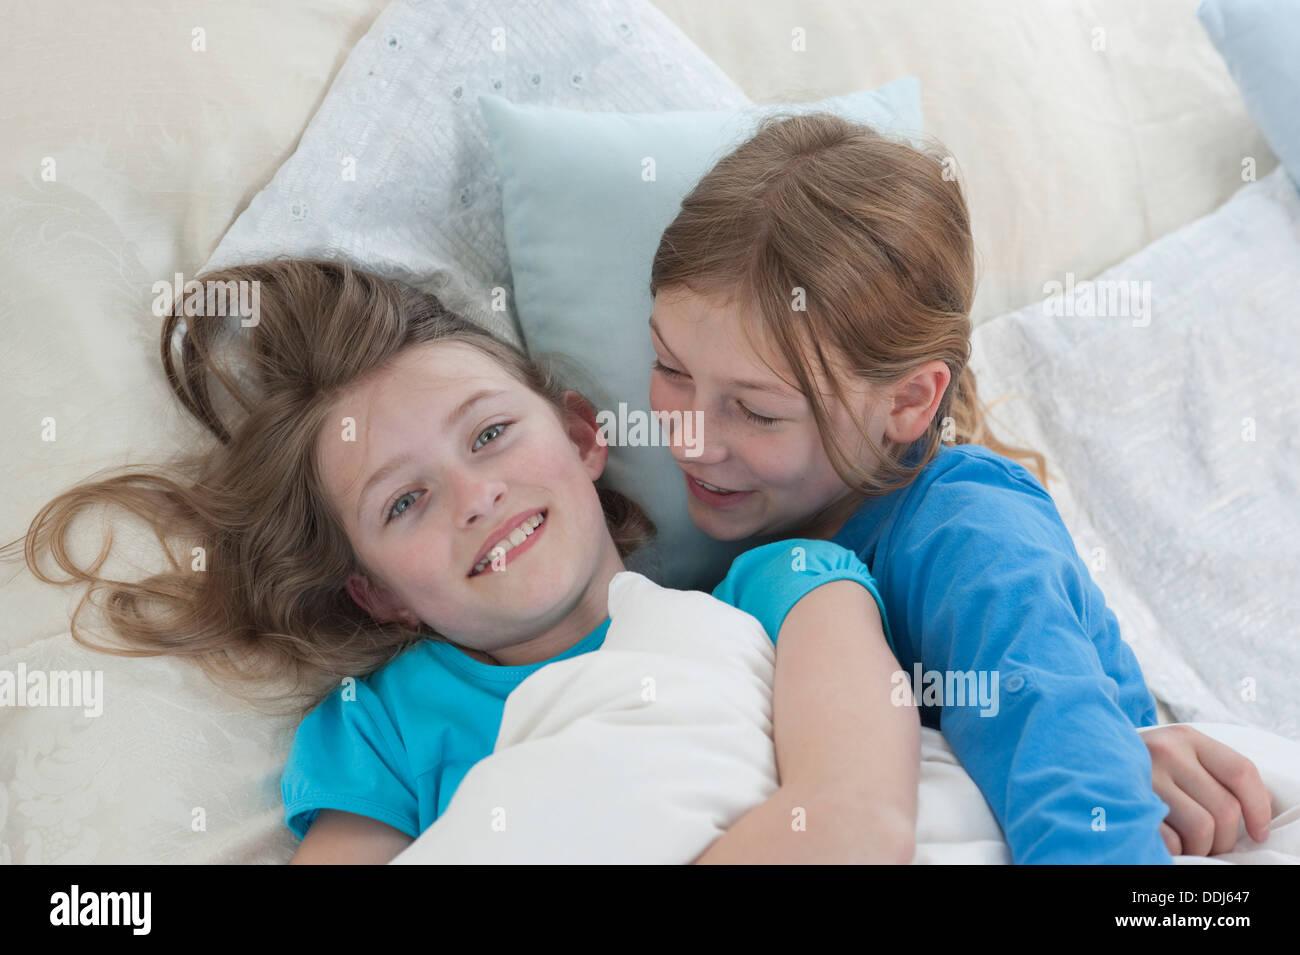 Germany, Bavaria, Girls telling secrets on bed, smiling - Stock Image